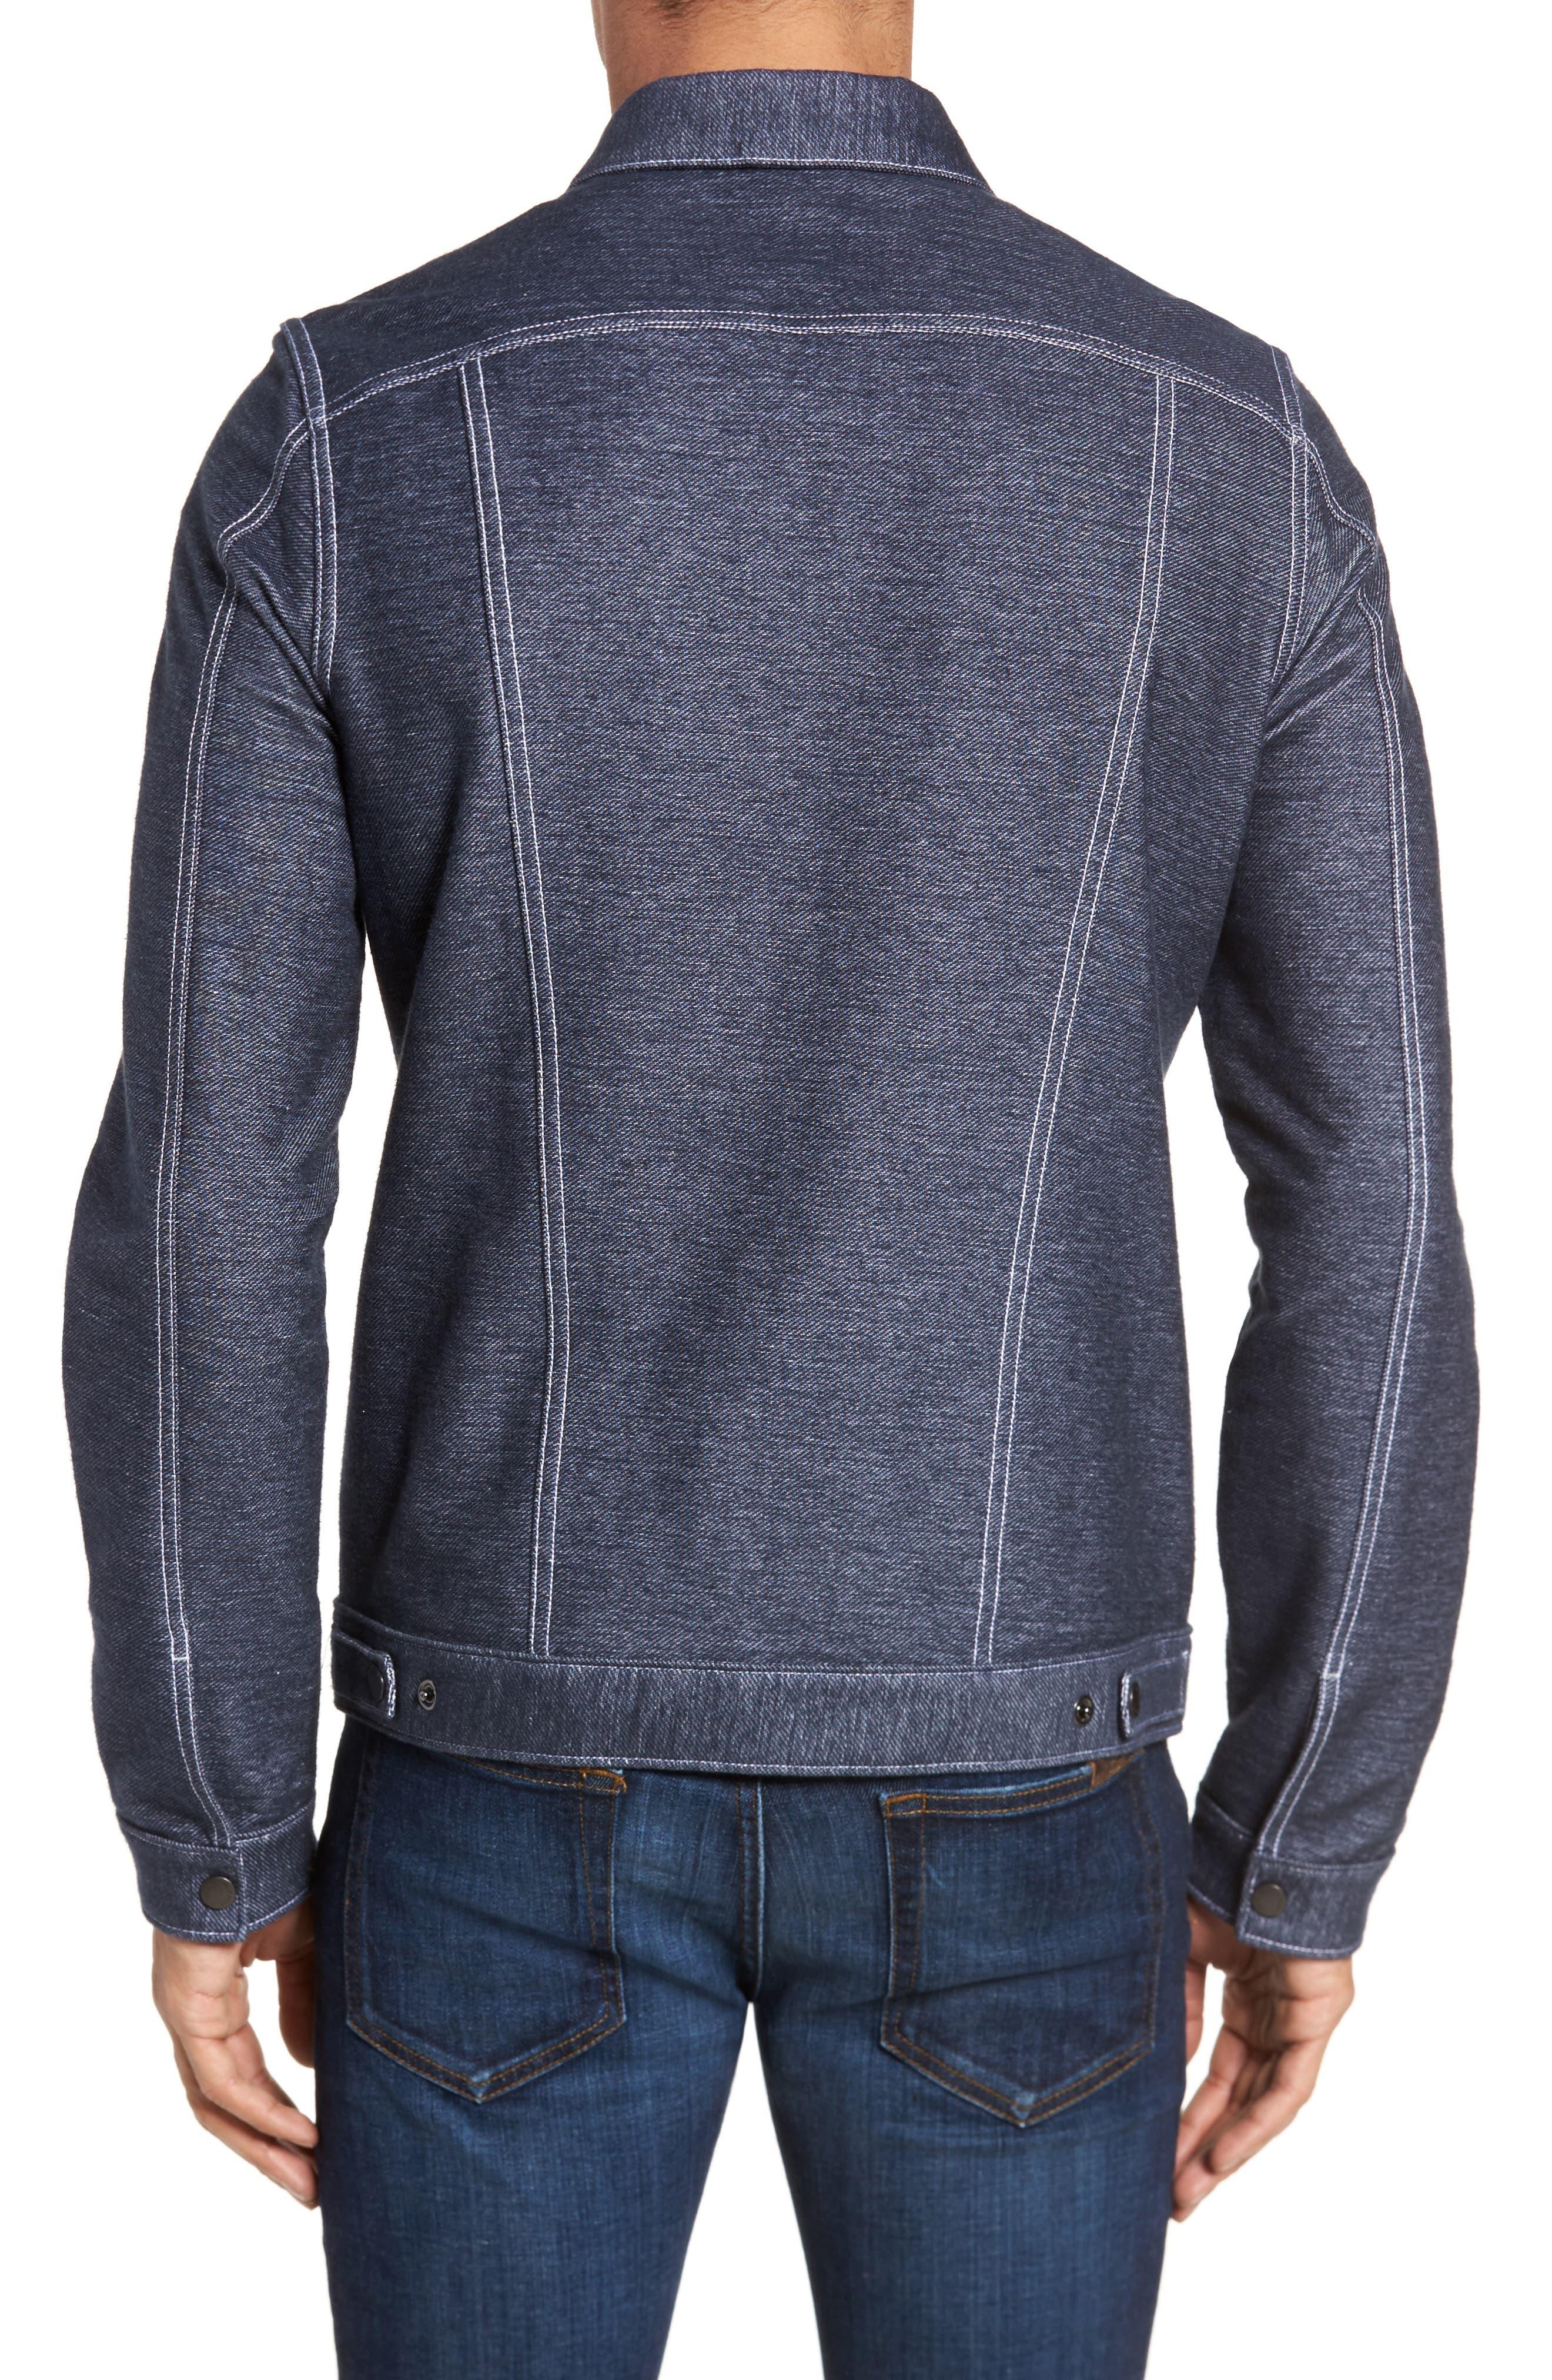 Sigmon Stretch Denim Jacket,                             Alternate thumbnail 2, color,                             Blue